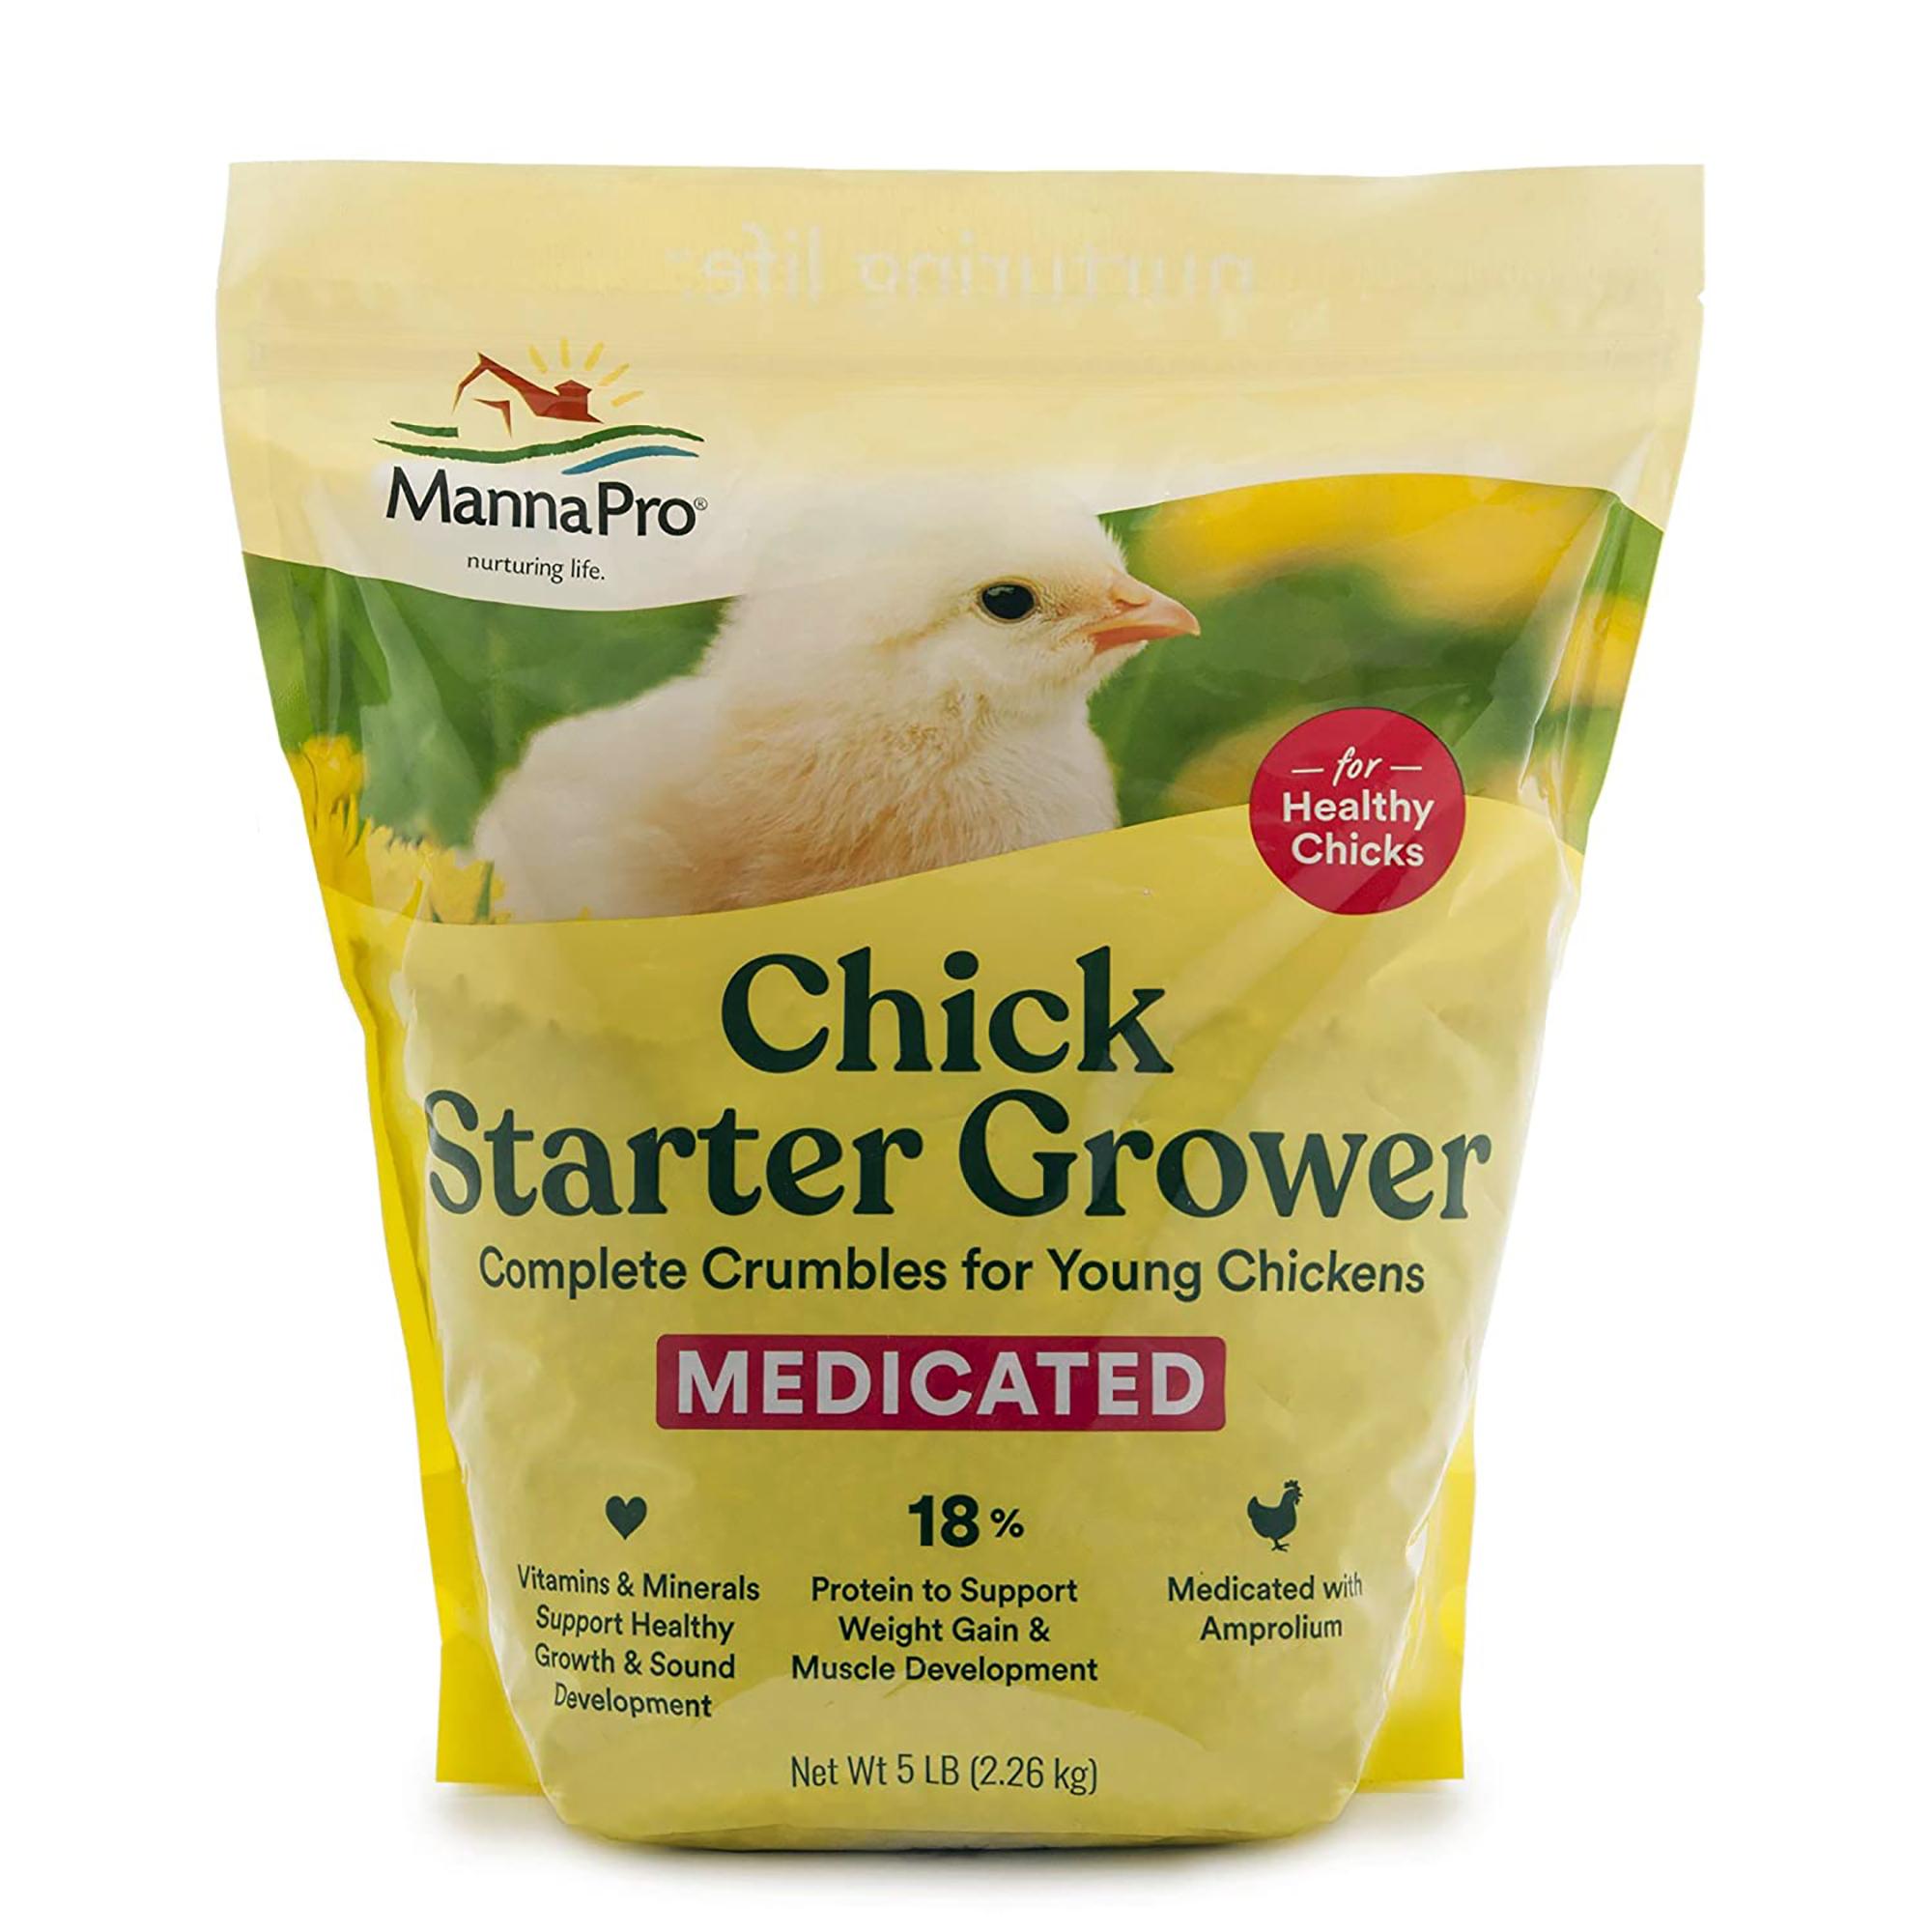 Manna Pro Chick Starter review